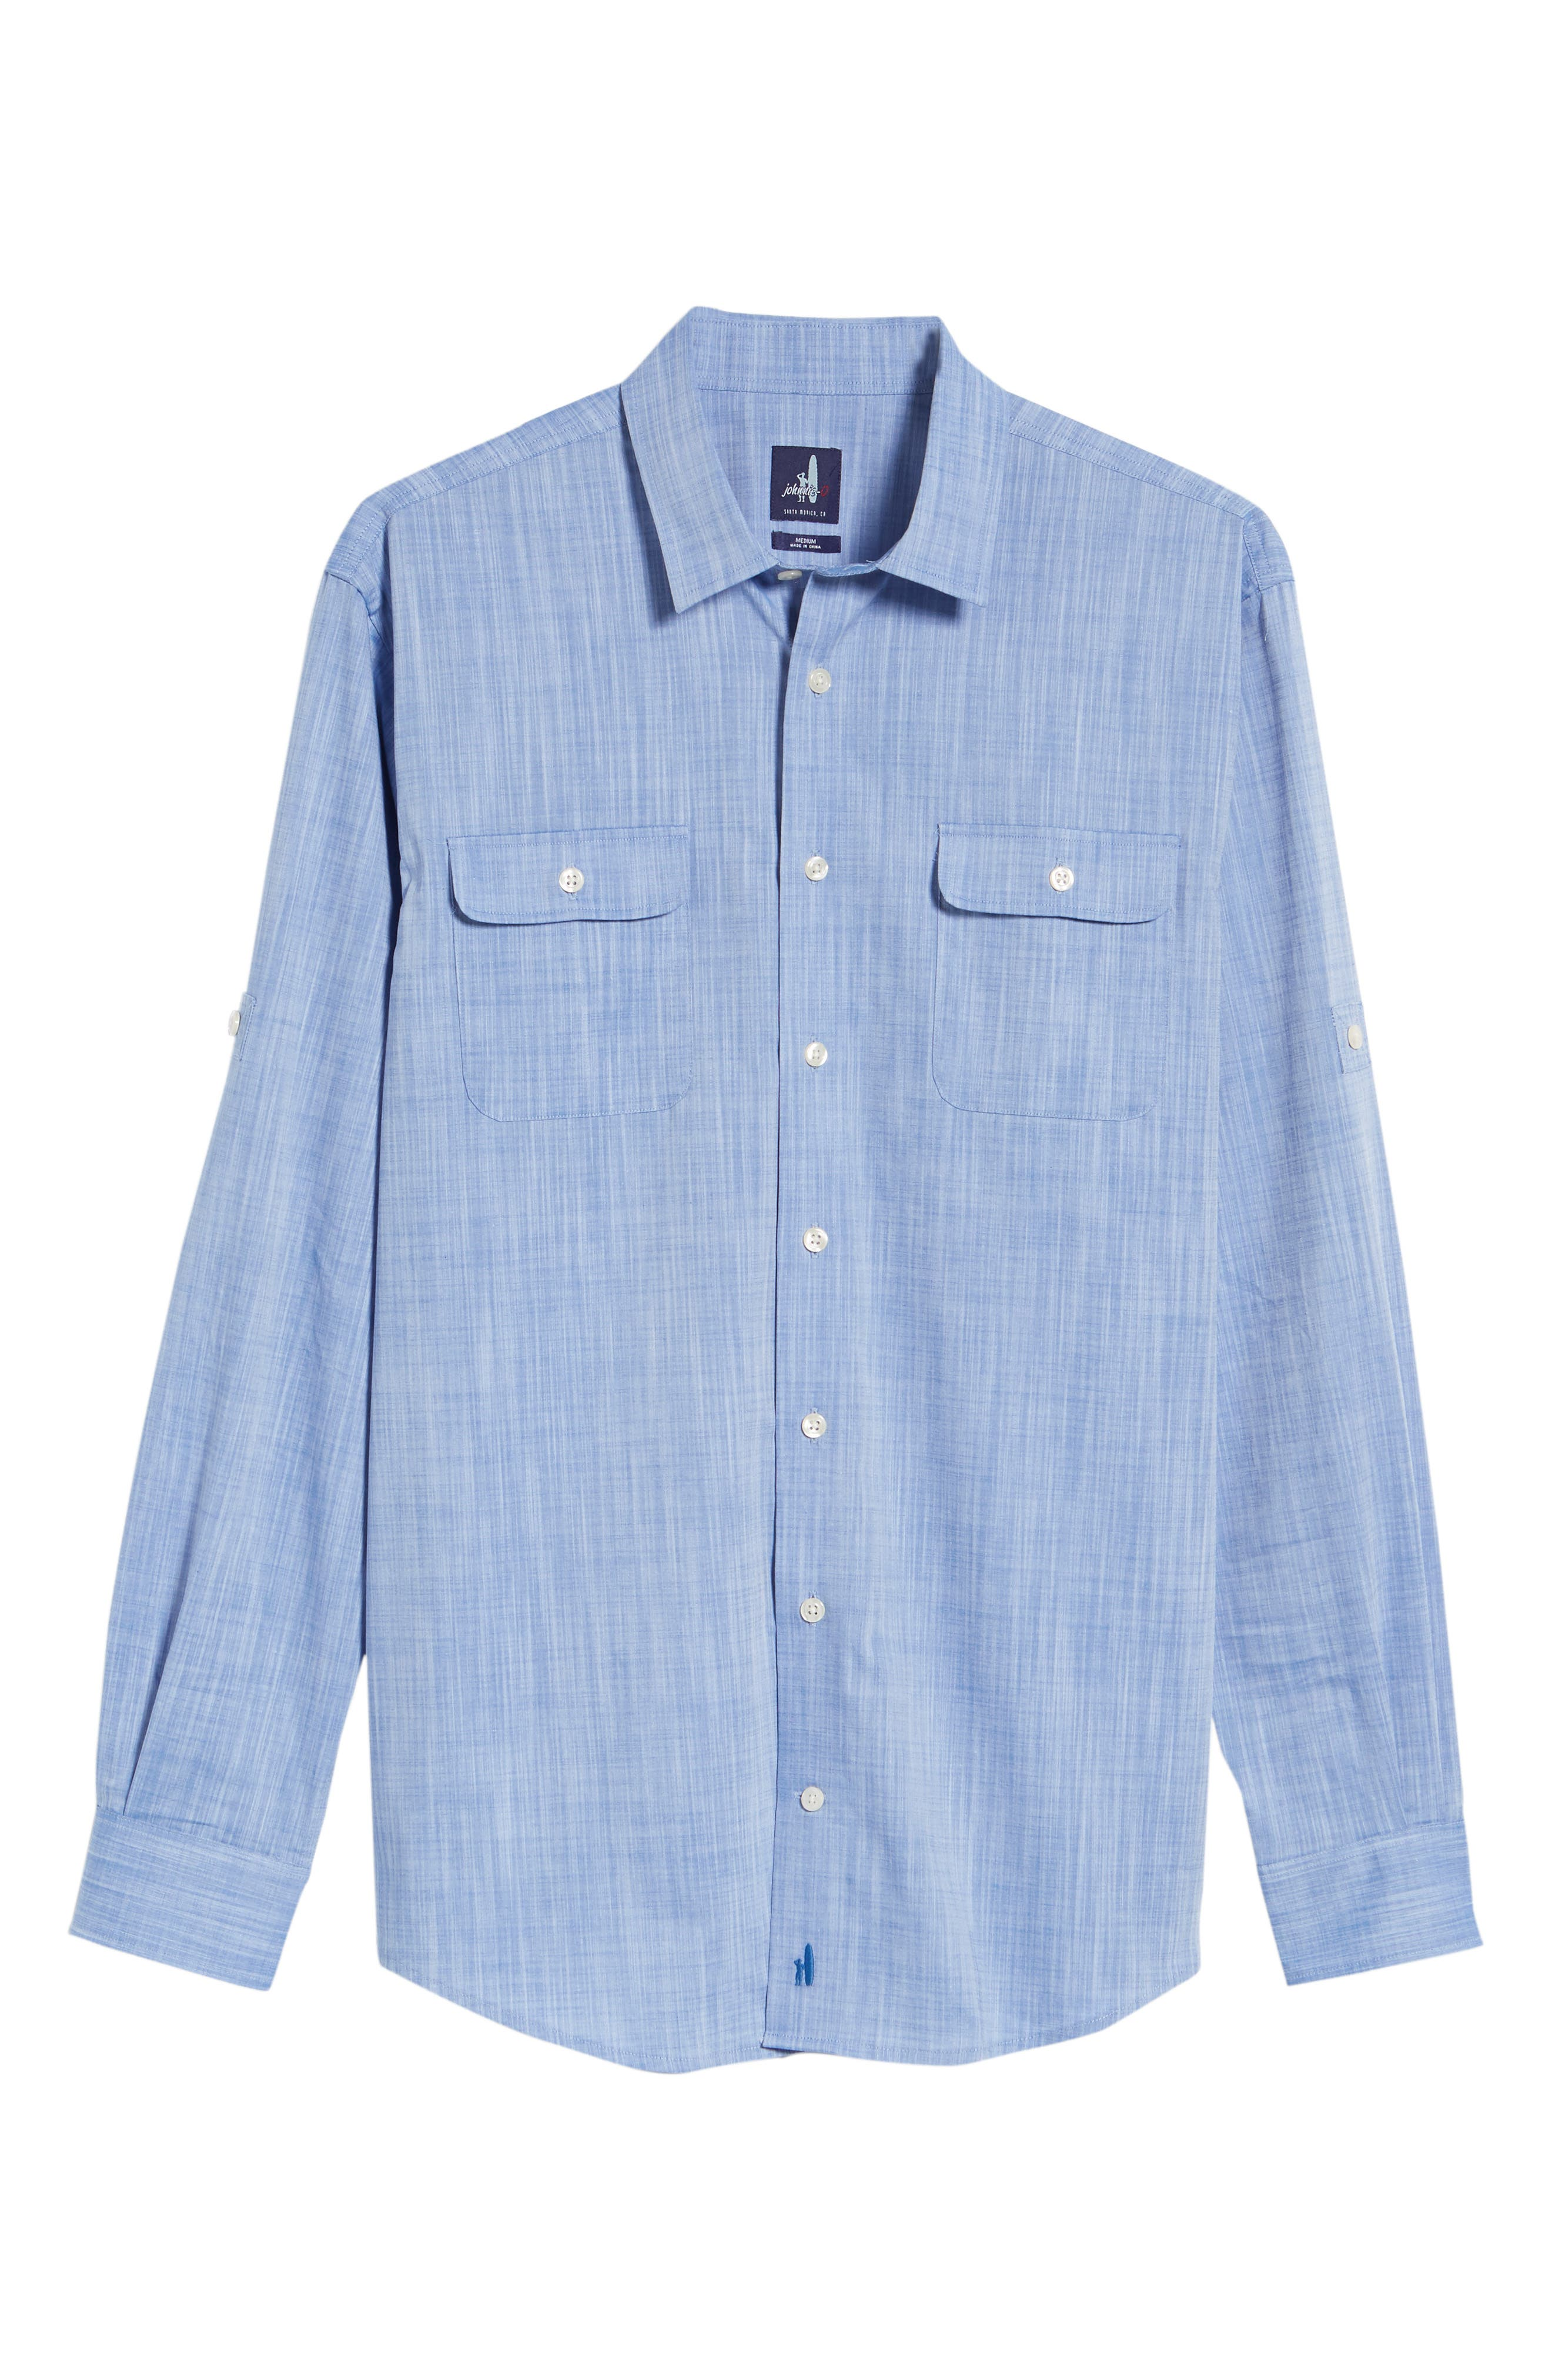 Hutton Classic Fit Shirt,                             Alternate thumbnail 5, color,                             Deep Water